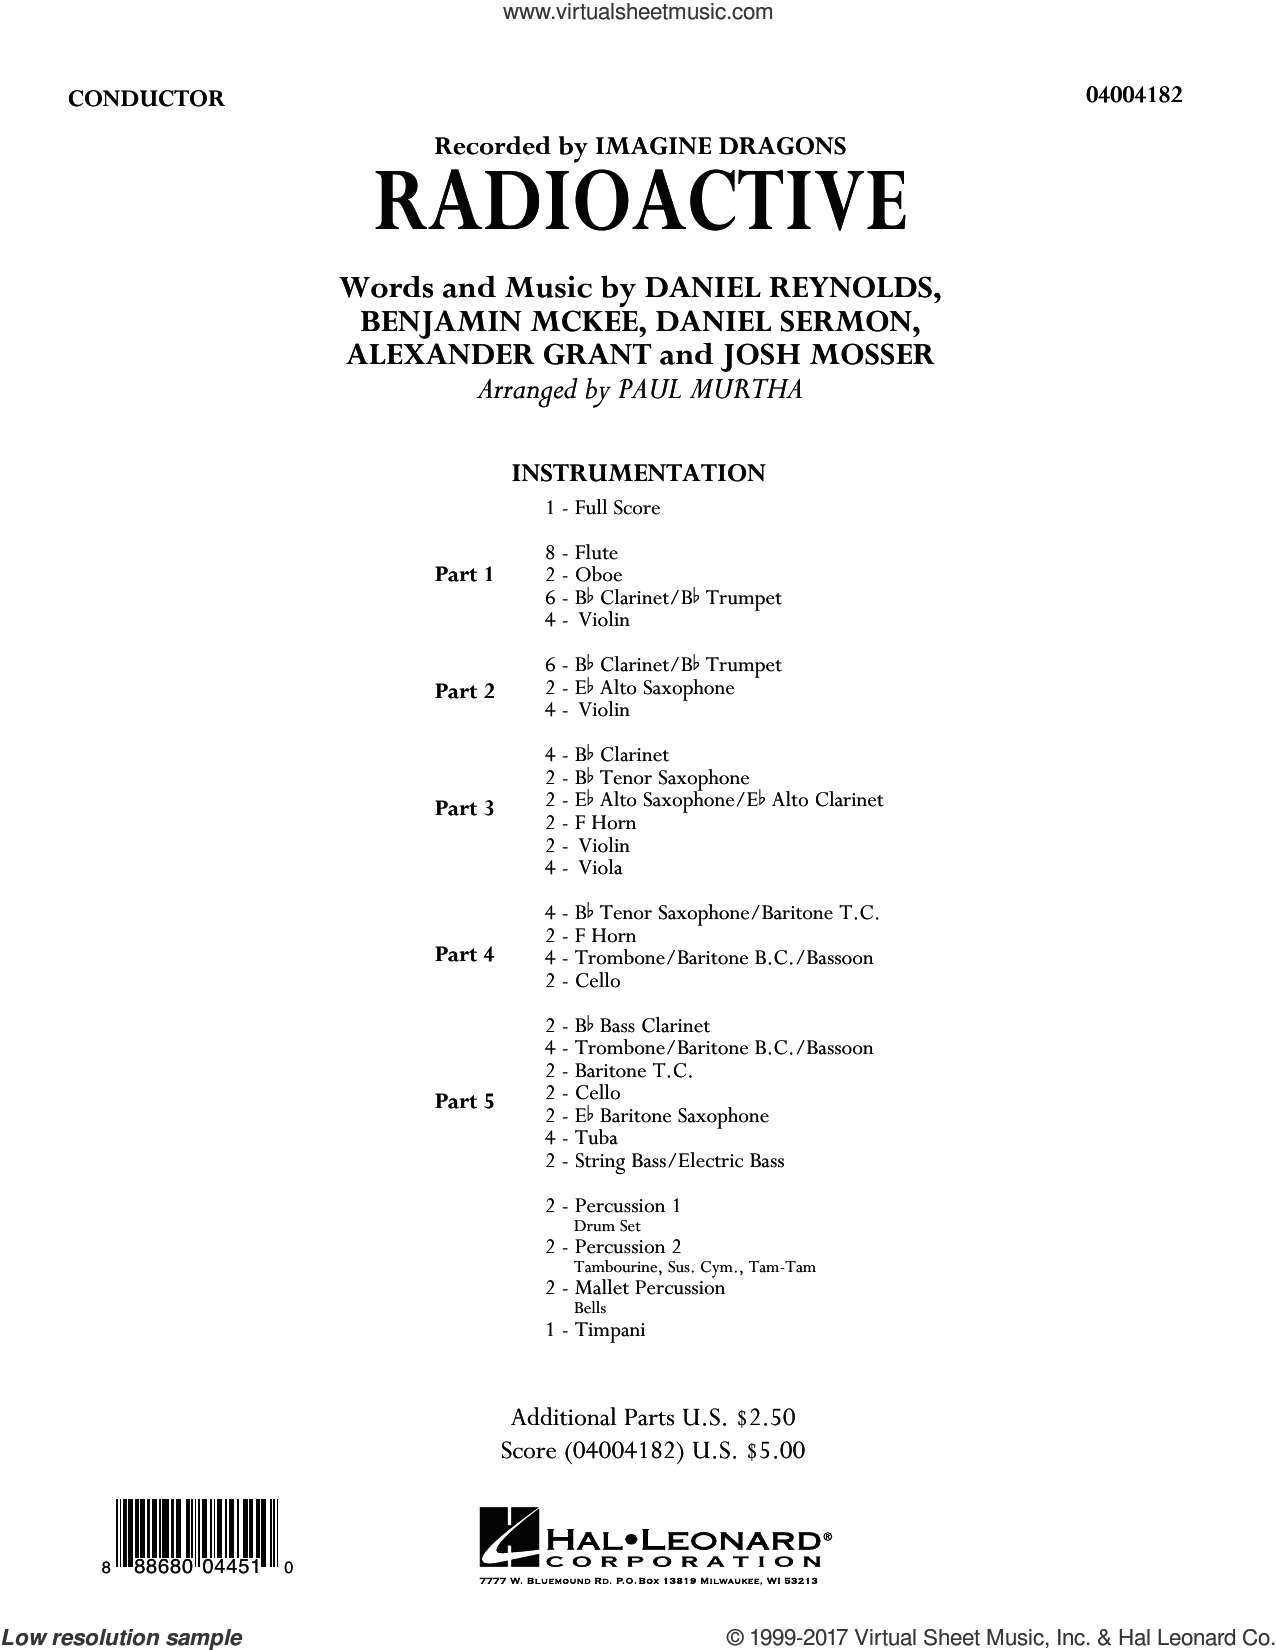 Radioactive (COMPLETE) sheet music for concert band by Paul Murtha, Alexander Grant, Benjamin McKee, Daniel Reynolds, Daniel Sermon, Imagine Dragons and Josh Mosser, intermediate skill level